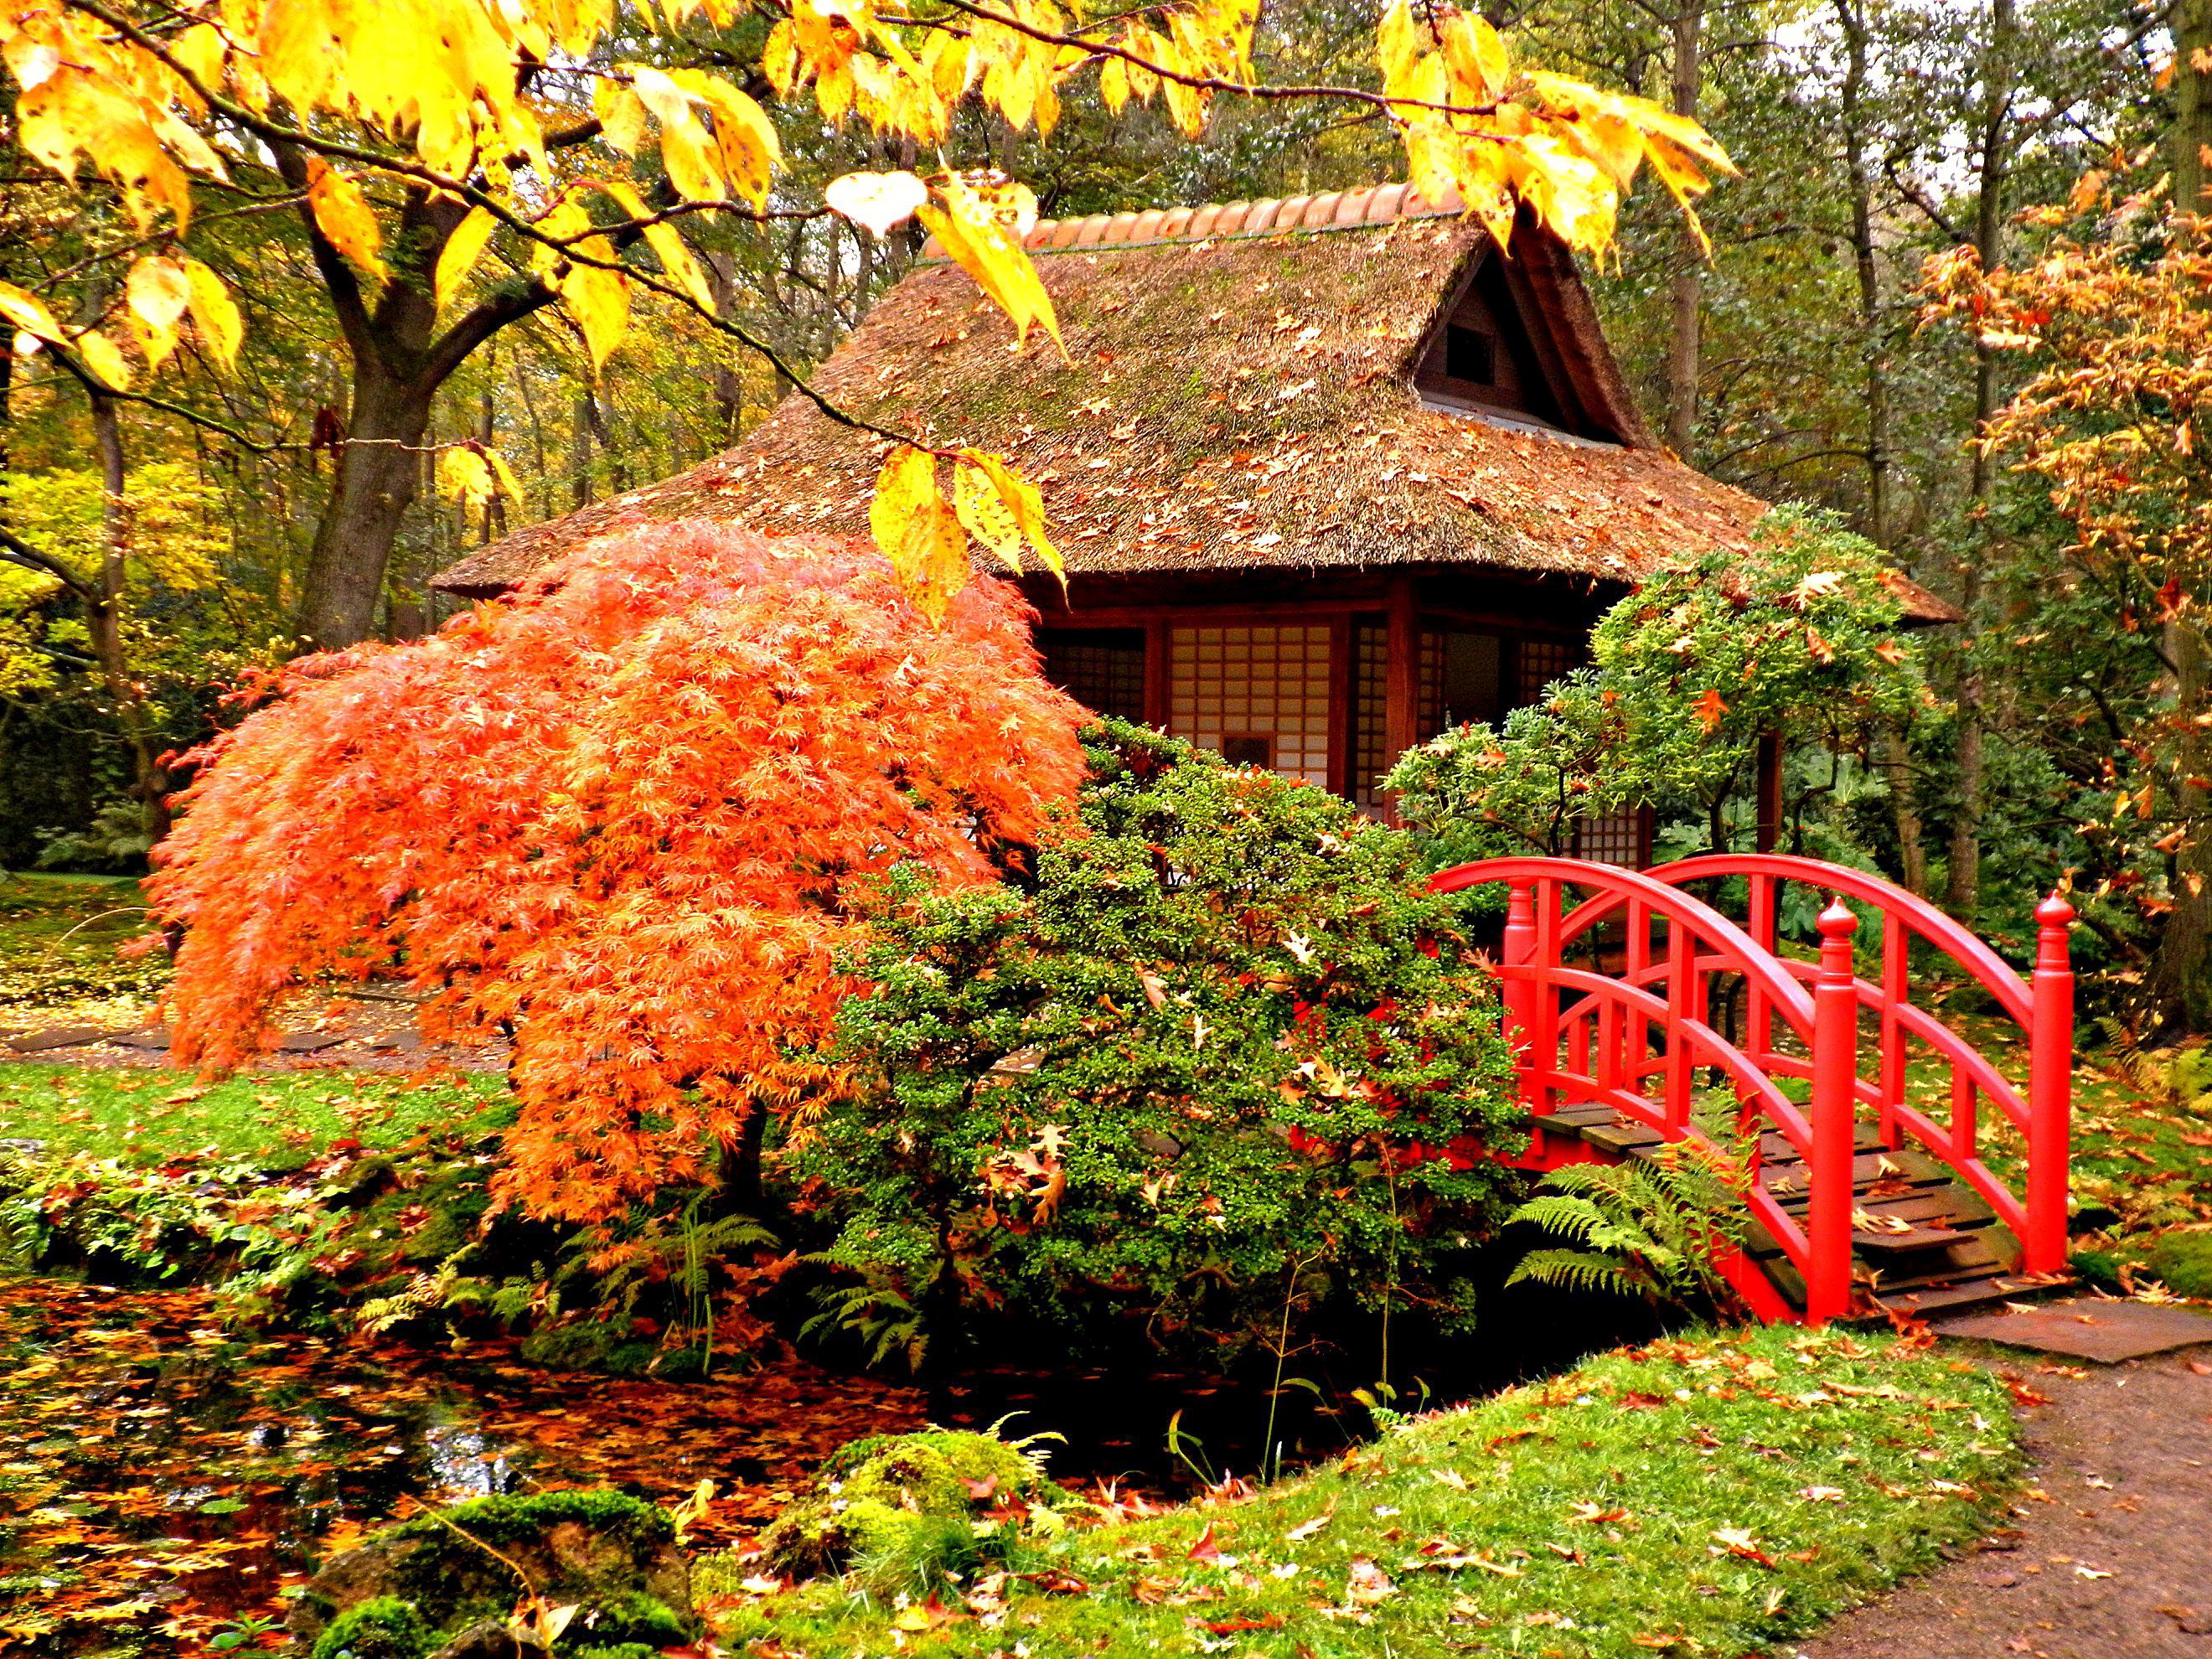 The Japanese Garden Desktop Background wallpapers HD   573338 2640x1980